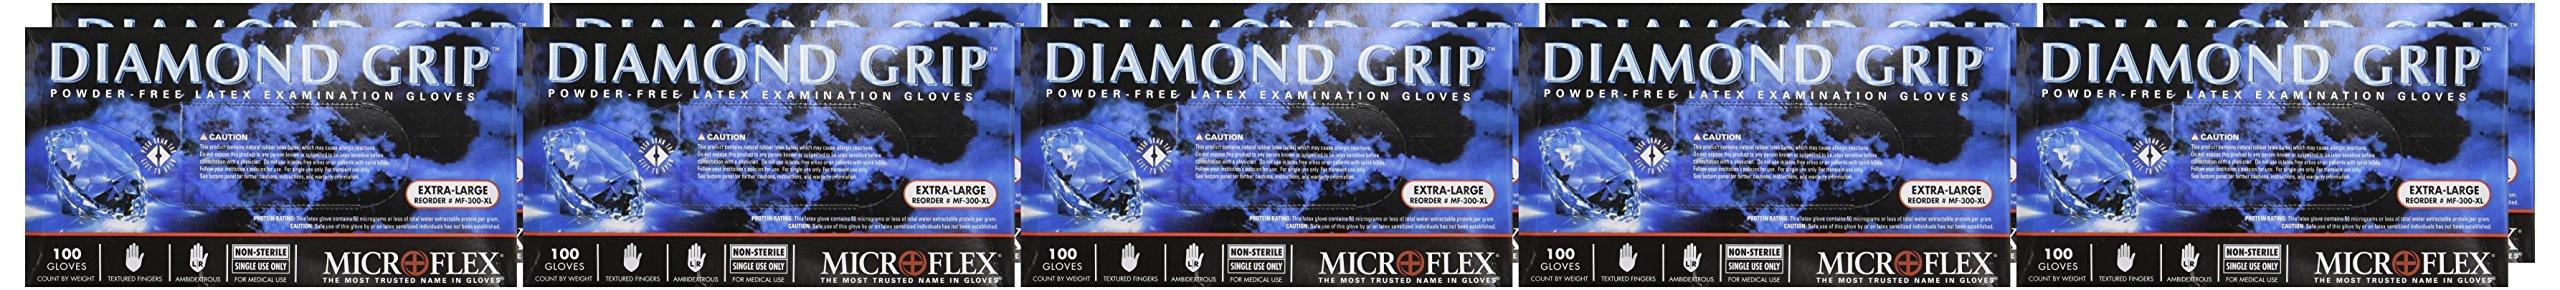 Microflex MF300XL-10PK - Diamond Grip Powder-Free Latex Gloves - Case Of 10 B... by Microflex (Image #2)